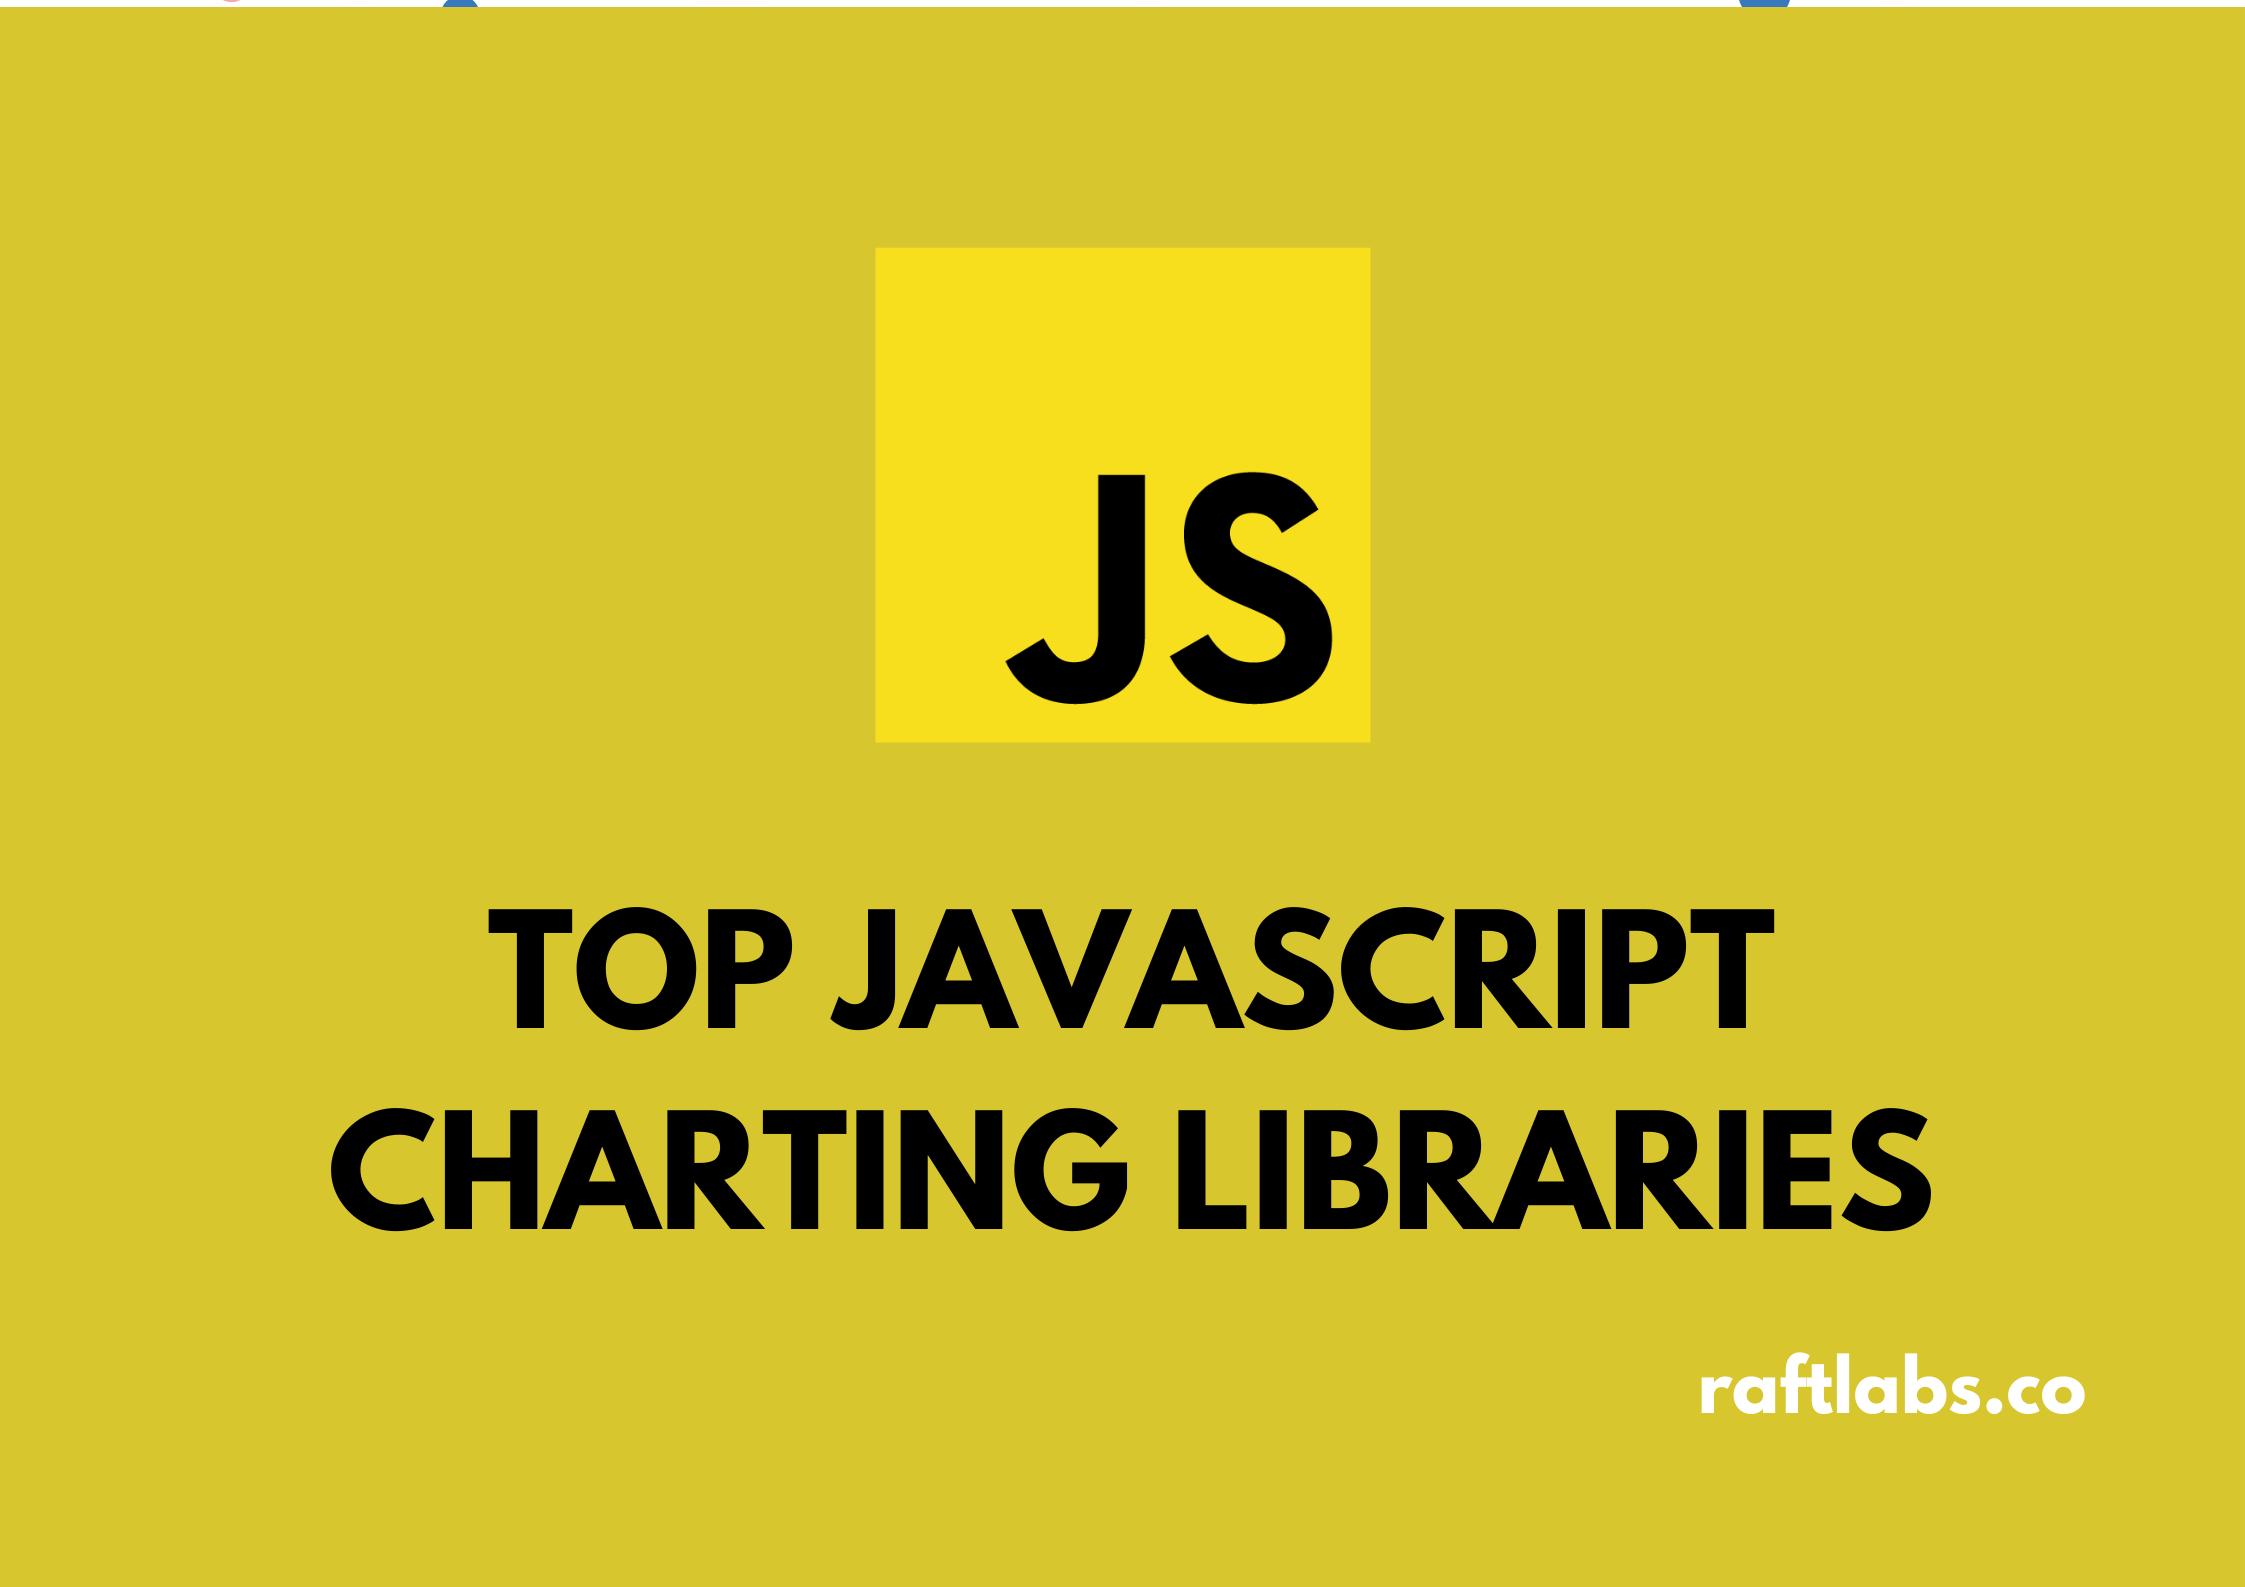 Thumbnail of Top JavaScript Charting Libraries